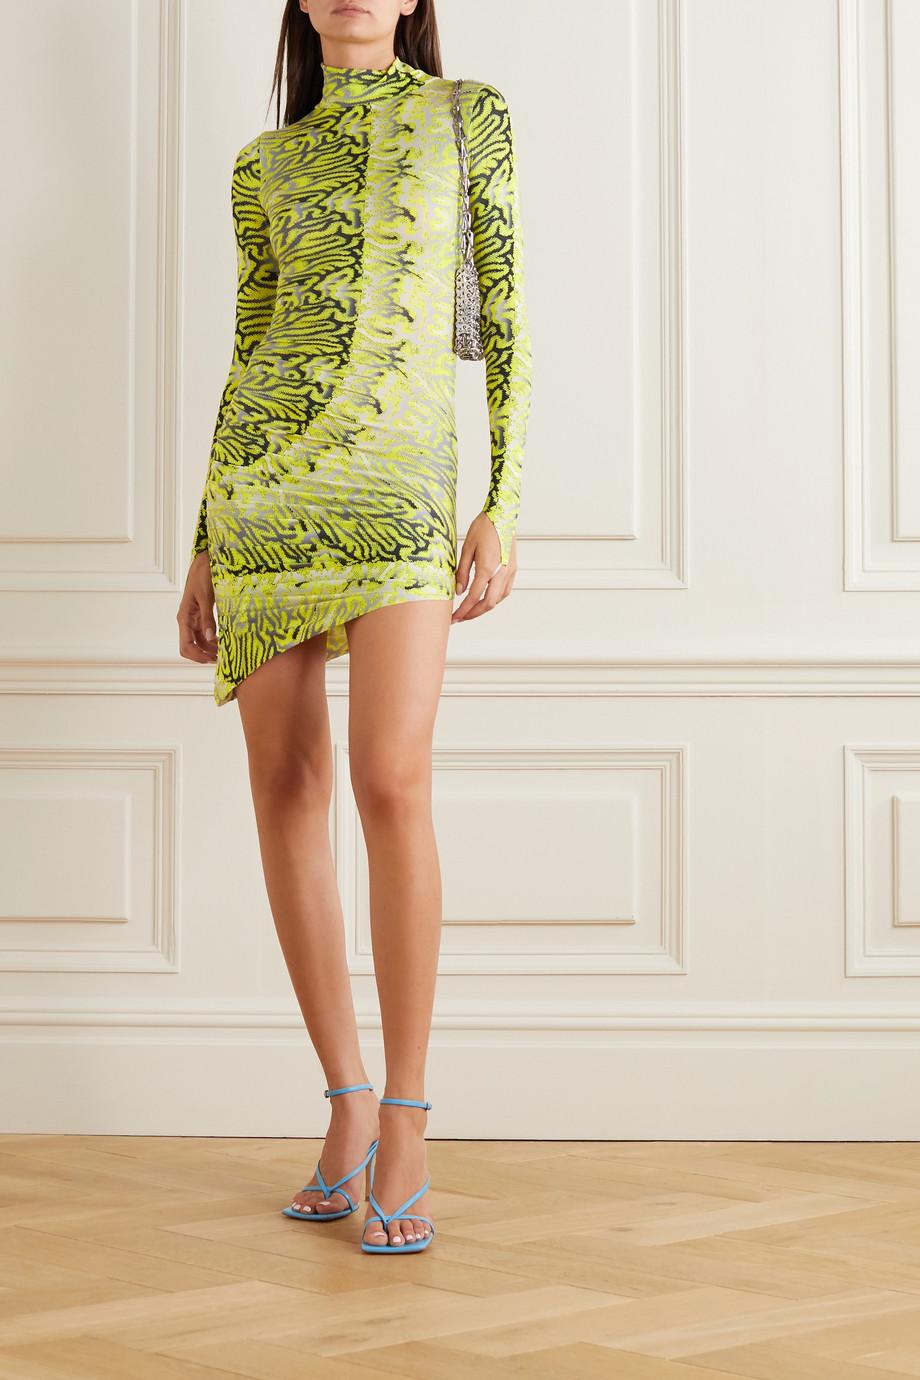 Maisie Wilen Orbit City 褶饰印花弹力平纹布高领迷你连衣裙